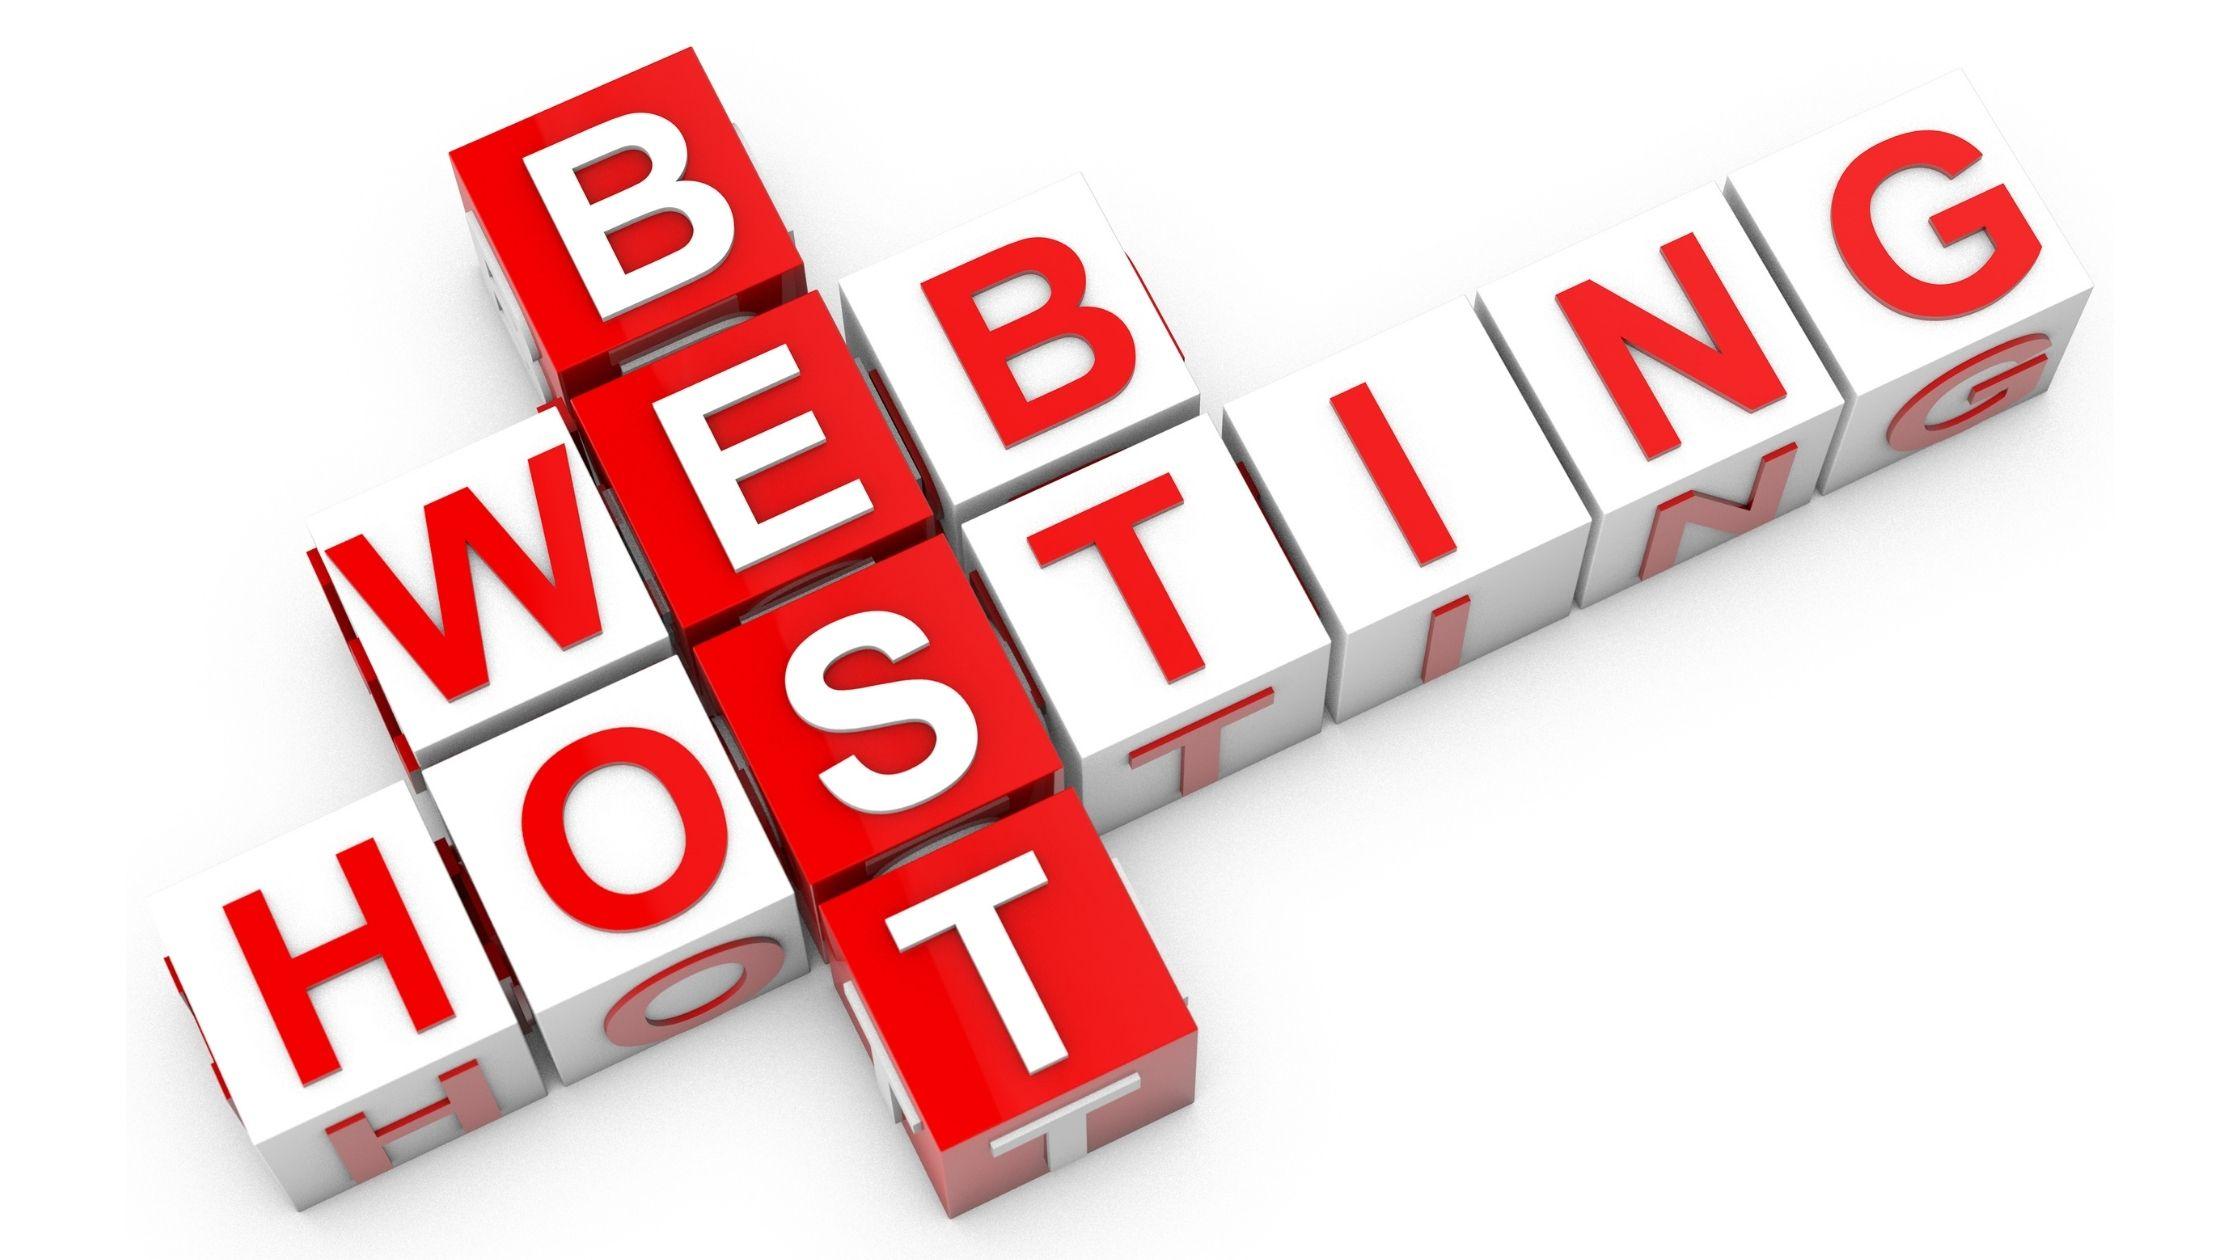 Image best web hosting for wordpress   DigitalPro